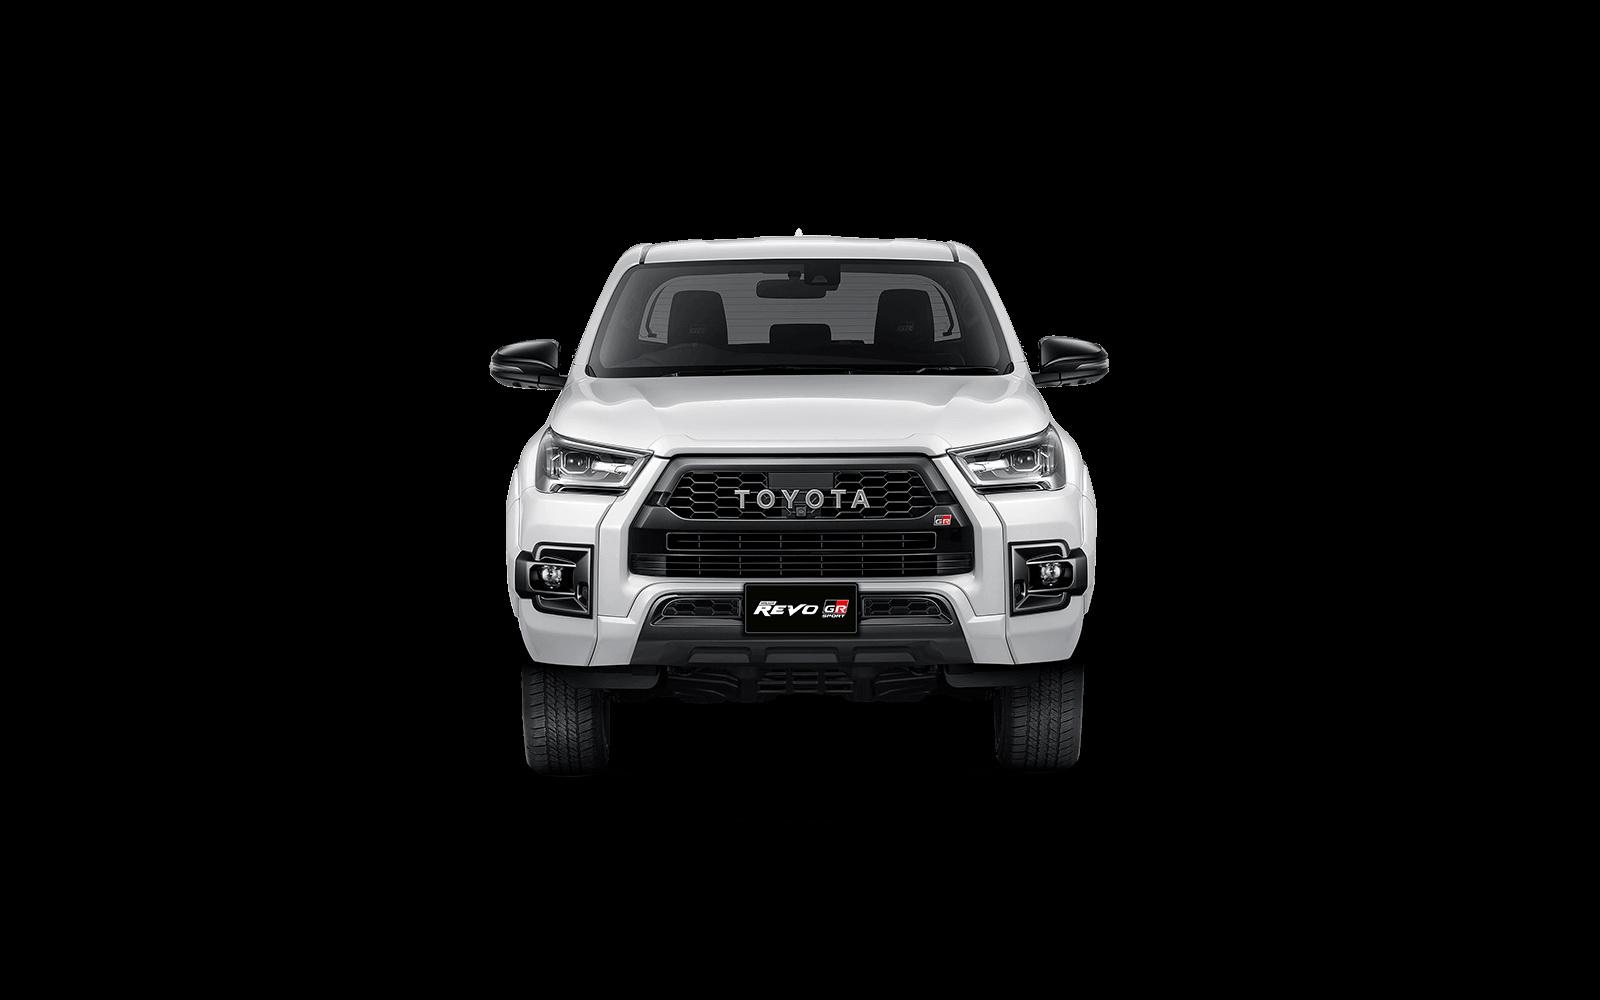 Toyota-Hilux-Revo-GR-Sport-17